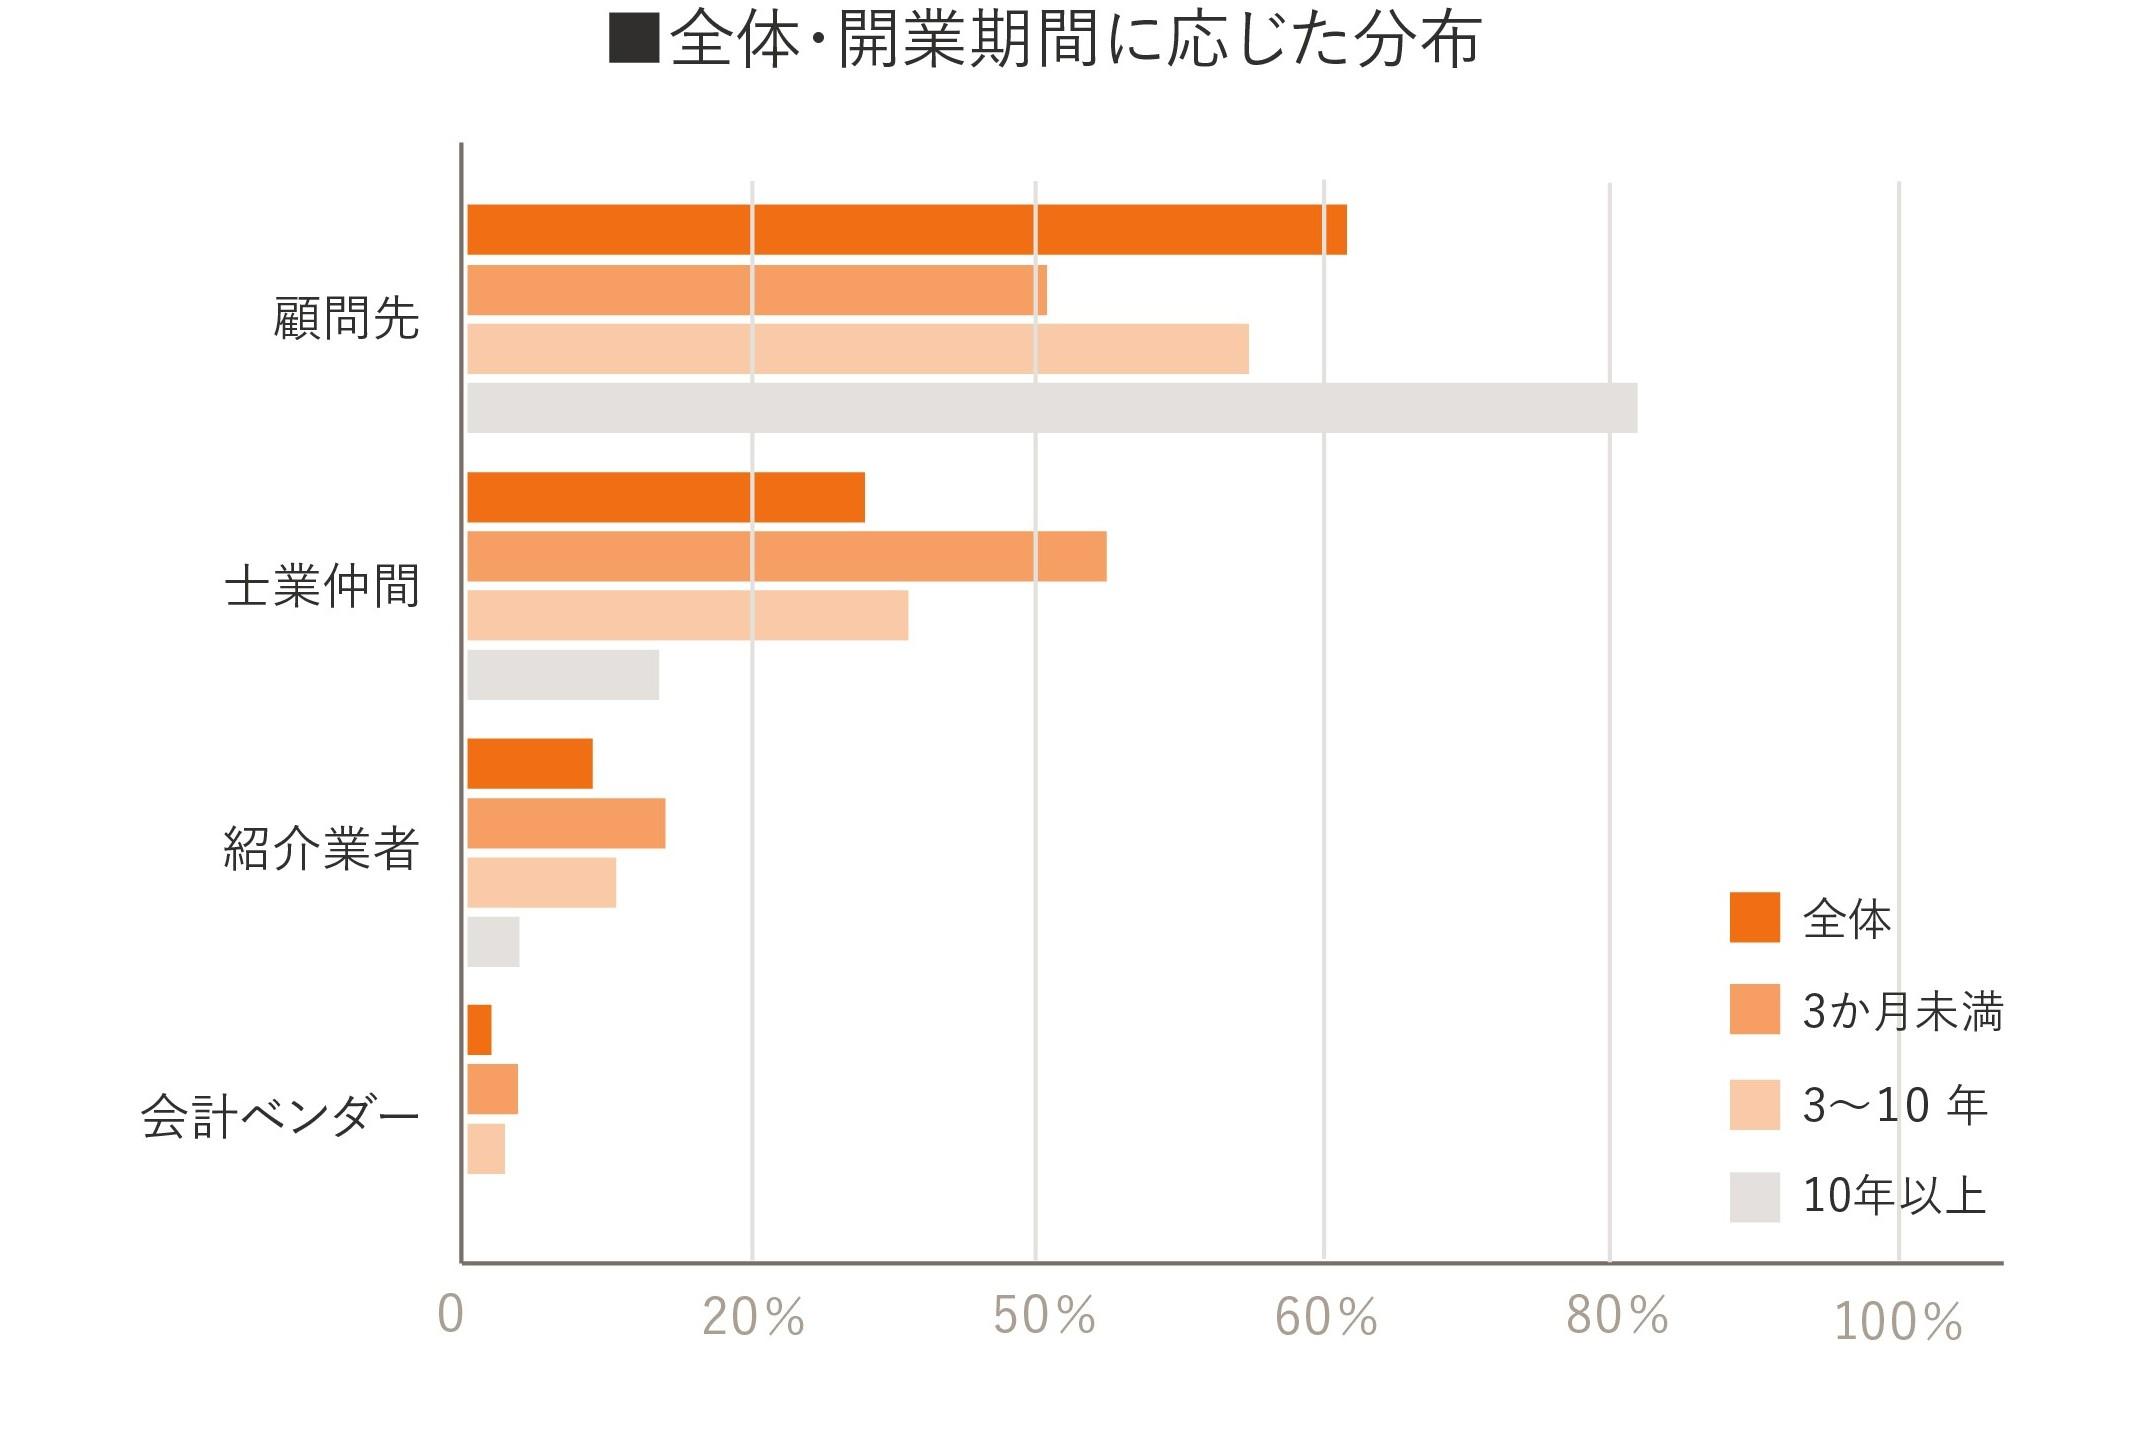 独立開業実態調査グラフ13